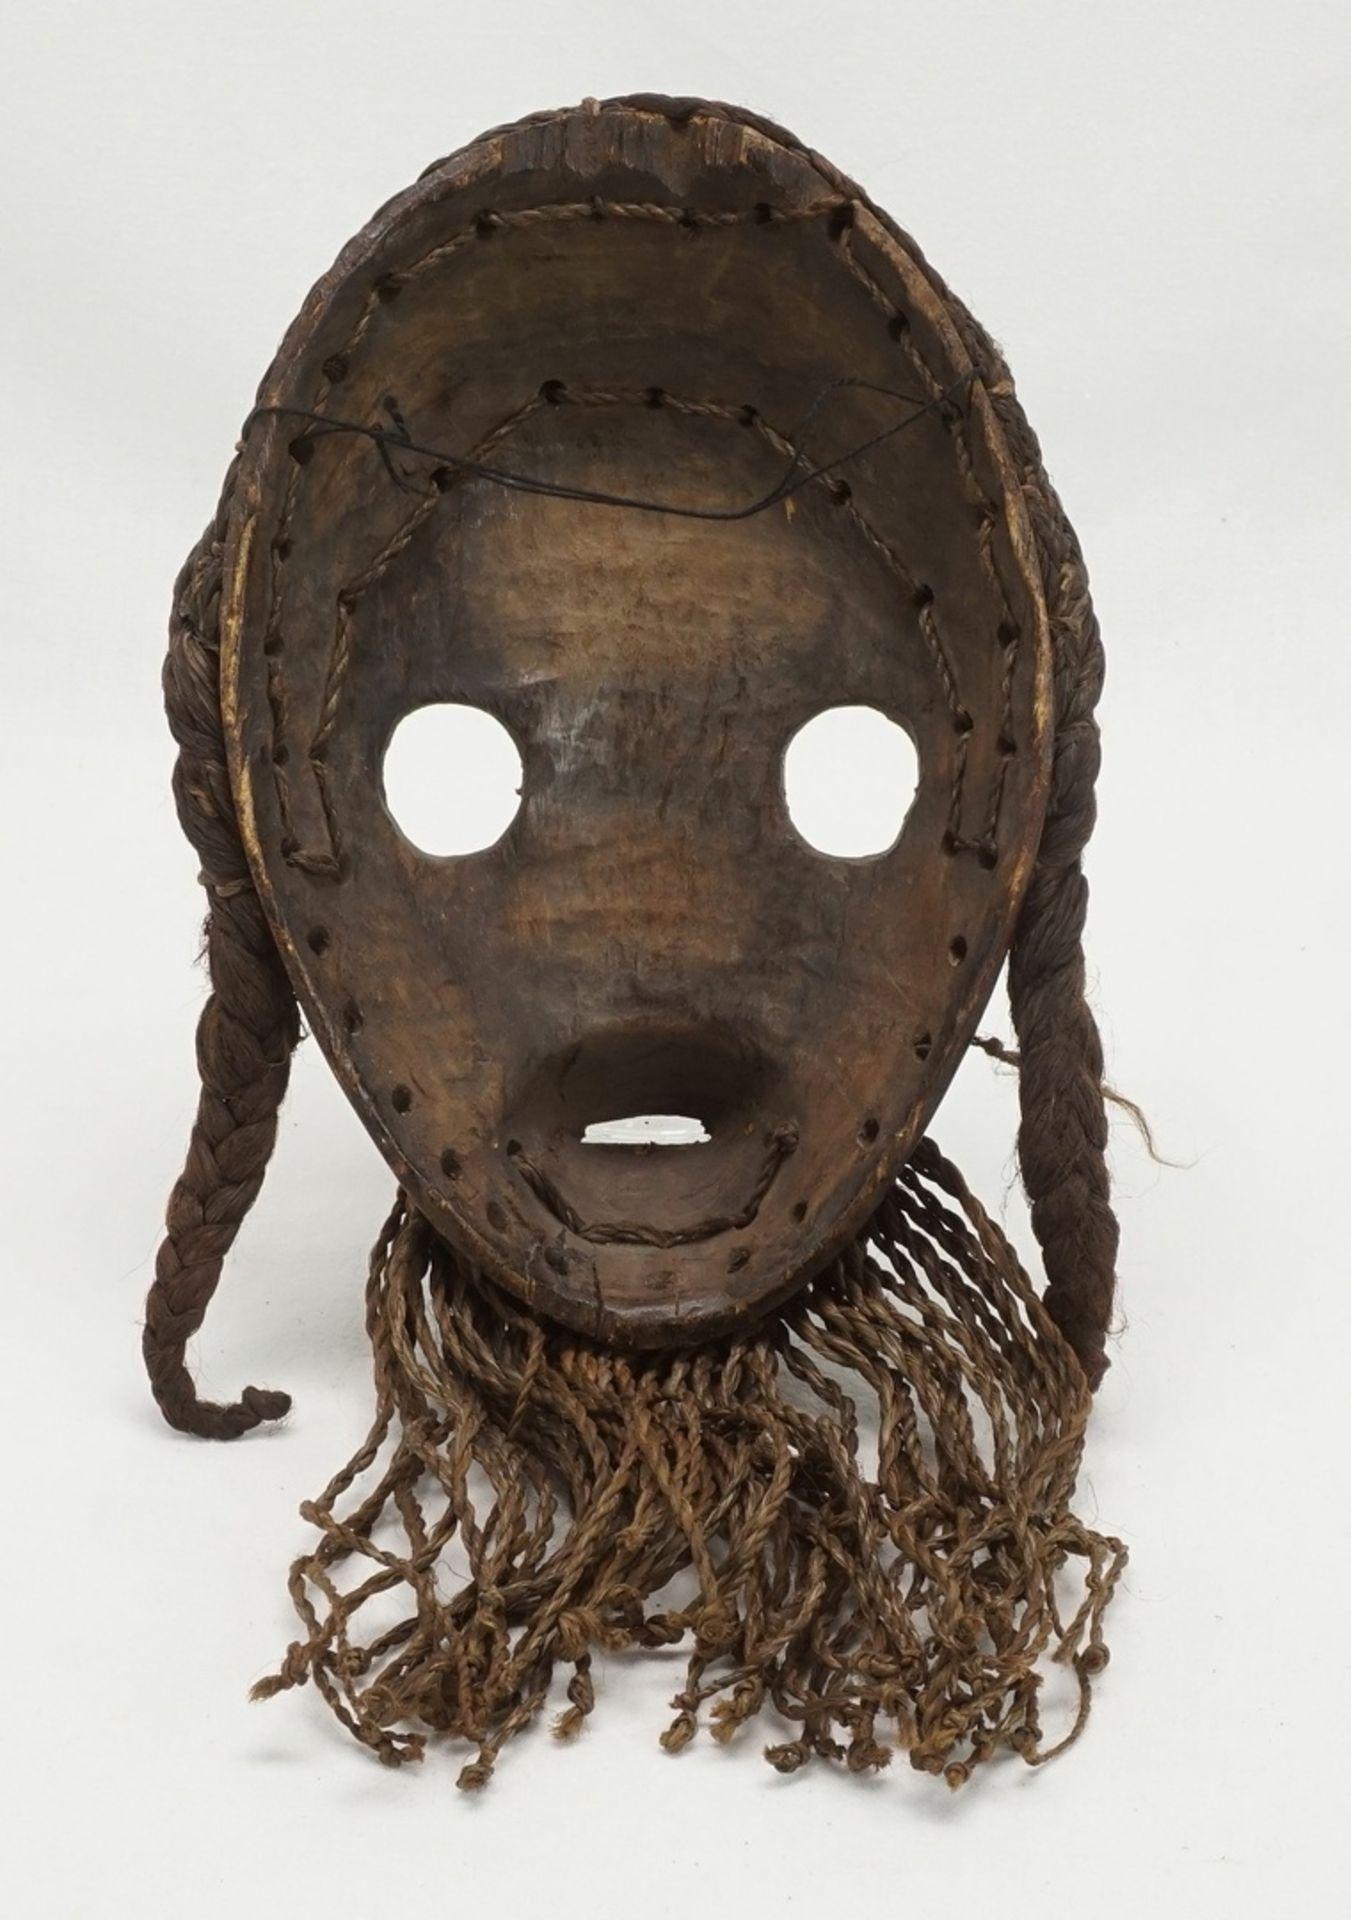 "Feuermeldermaske ""zakpai"", Dan, Elfenbeinküste (Côte d'Ivoire) - Bild 2 aus 2"